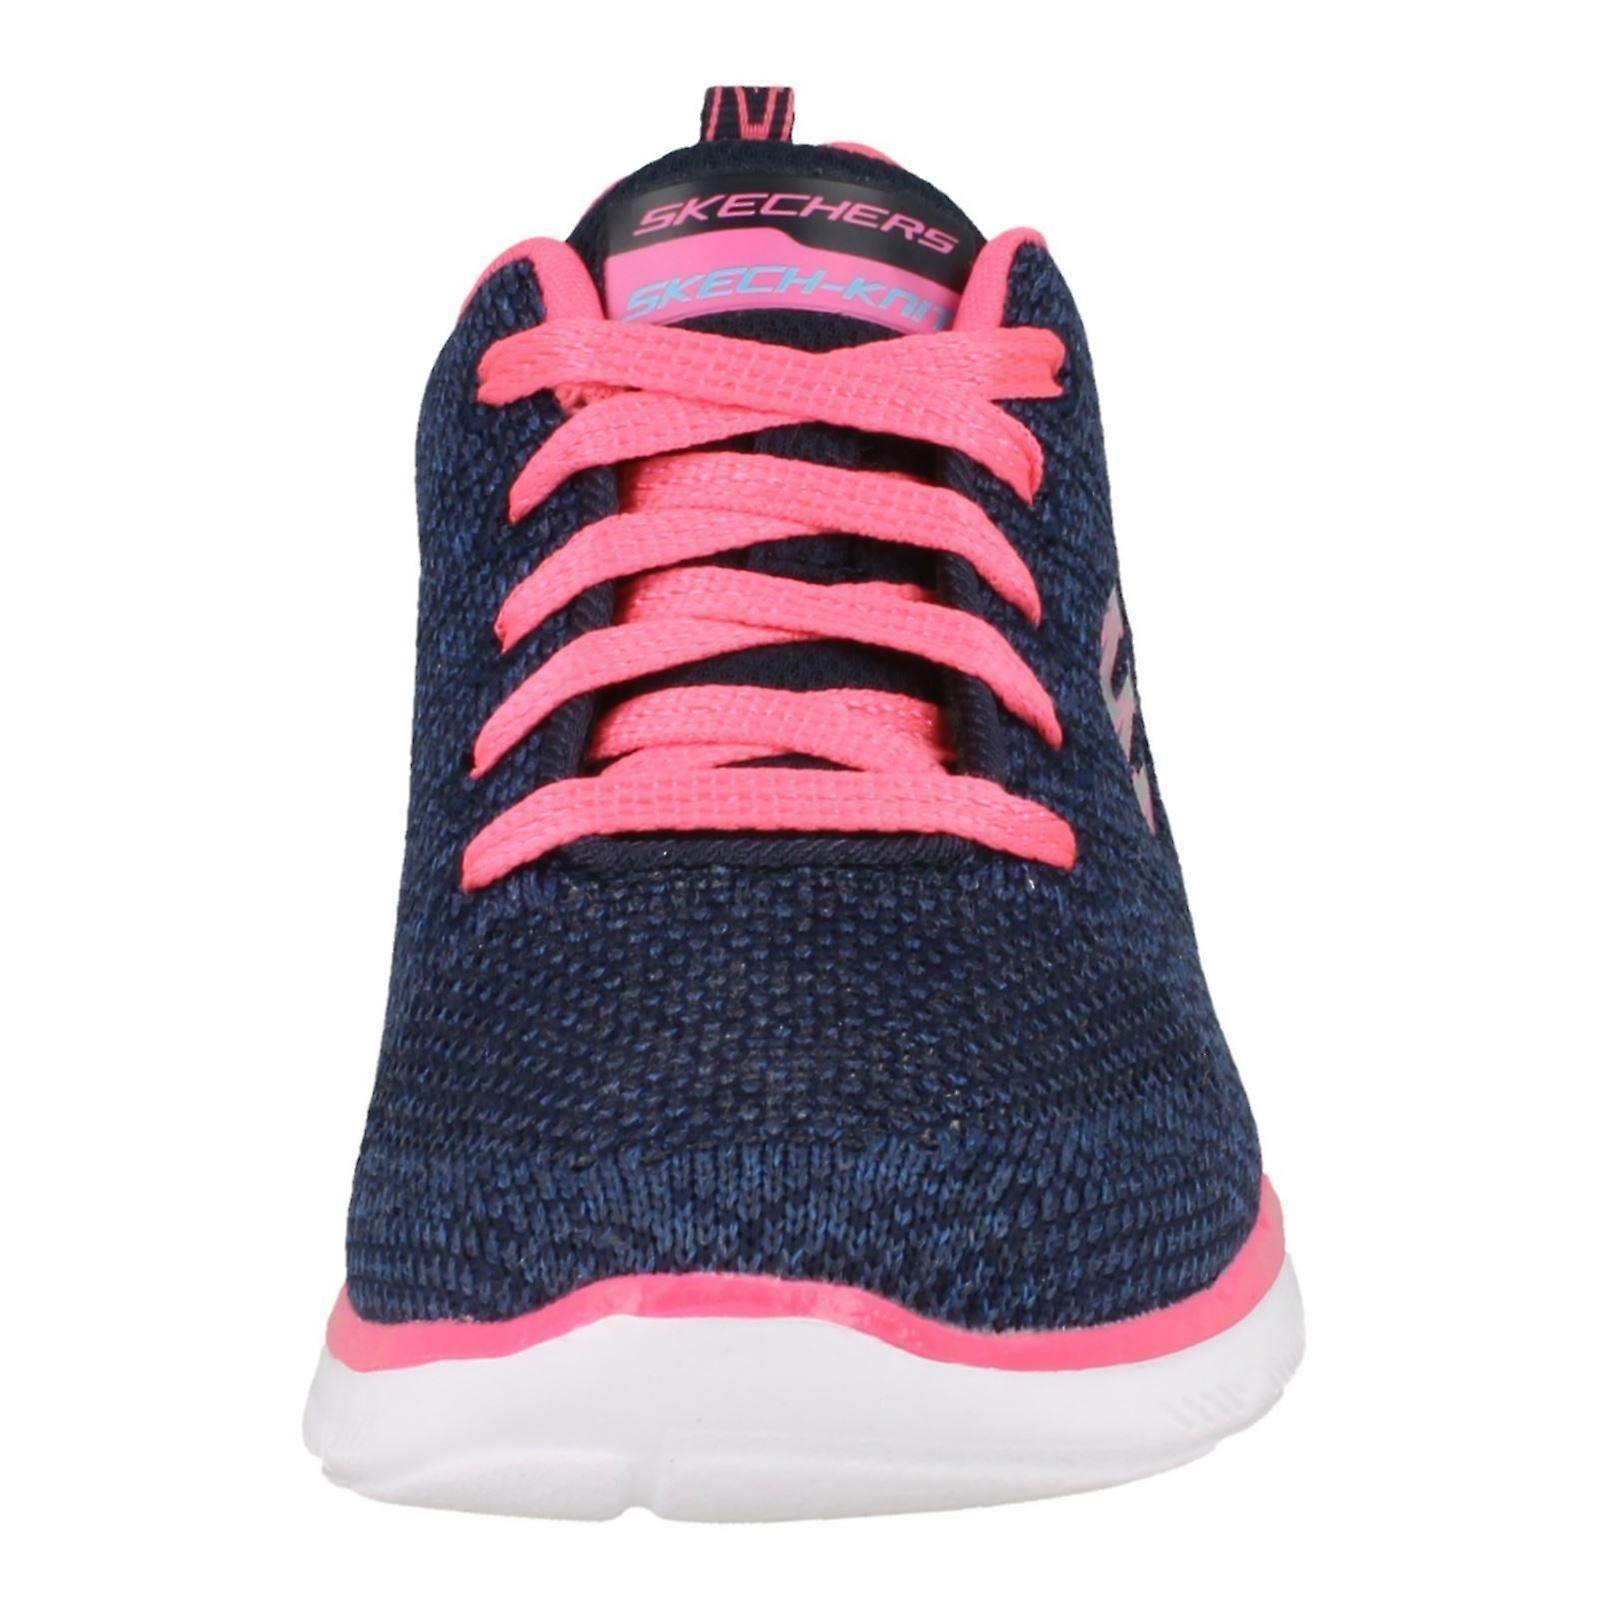 Girls Skechers Skech Knit Trainers High Energy 81655 NavyHot Pink Textile UK Size 11.5 EU Size 29 US Size 12.5